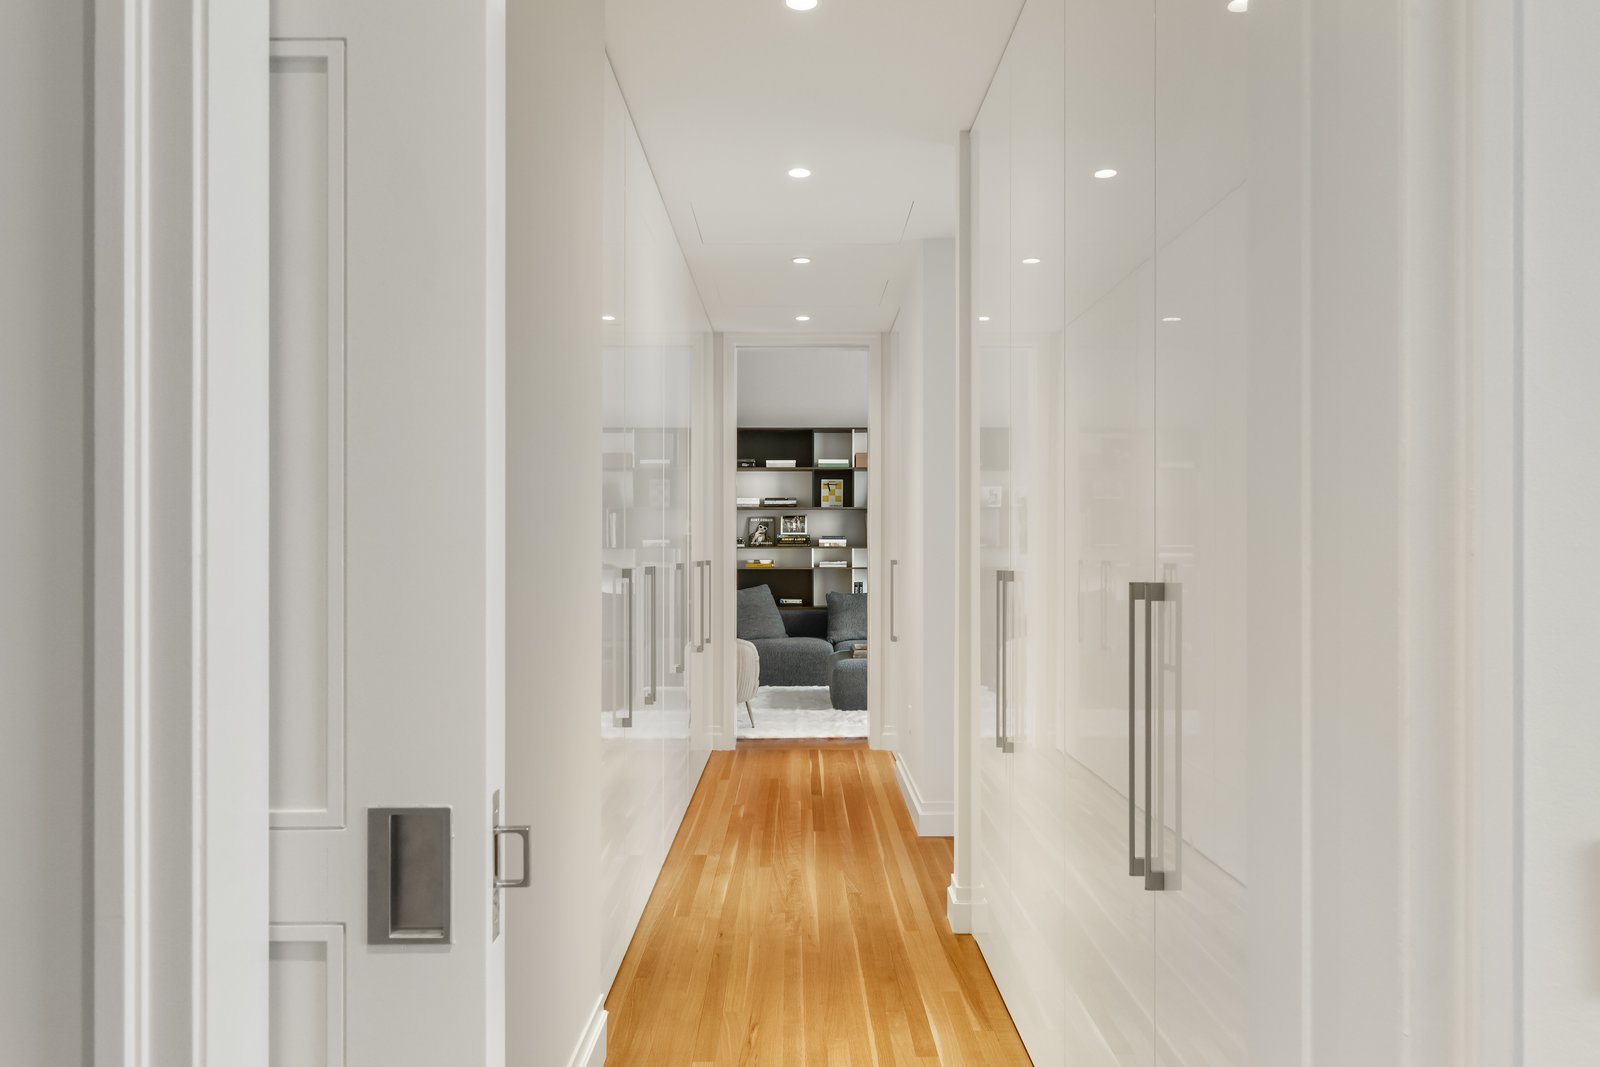 J.Lo and A-Rod's 432 Park Avenue apartment hallway